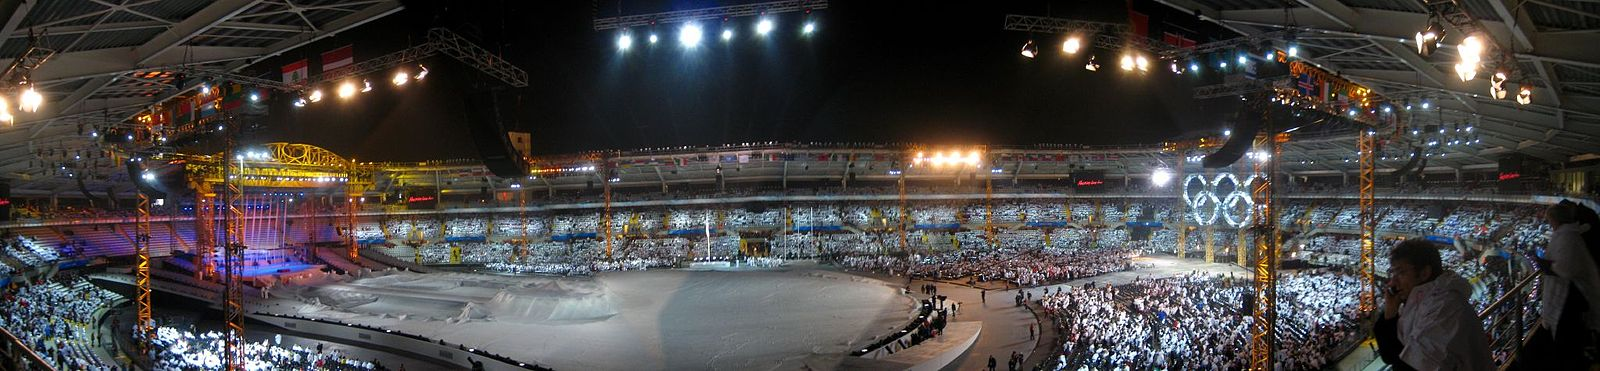 The Olympics Closing Ceremony